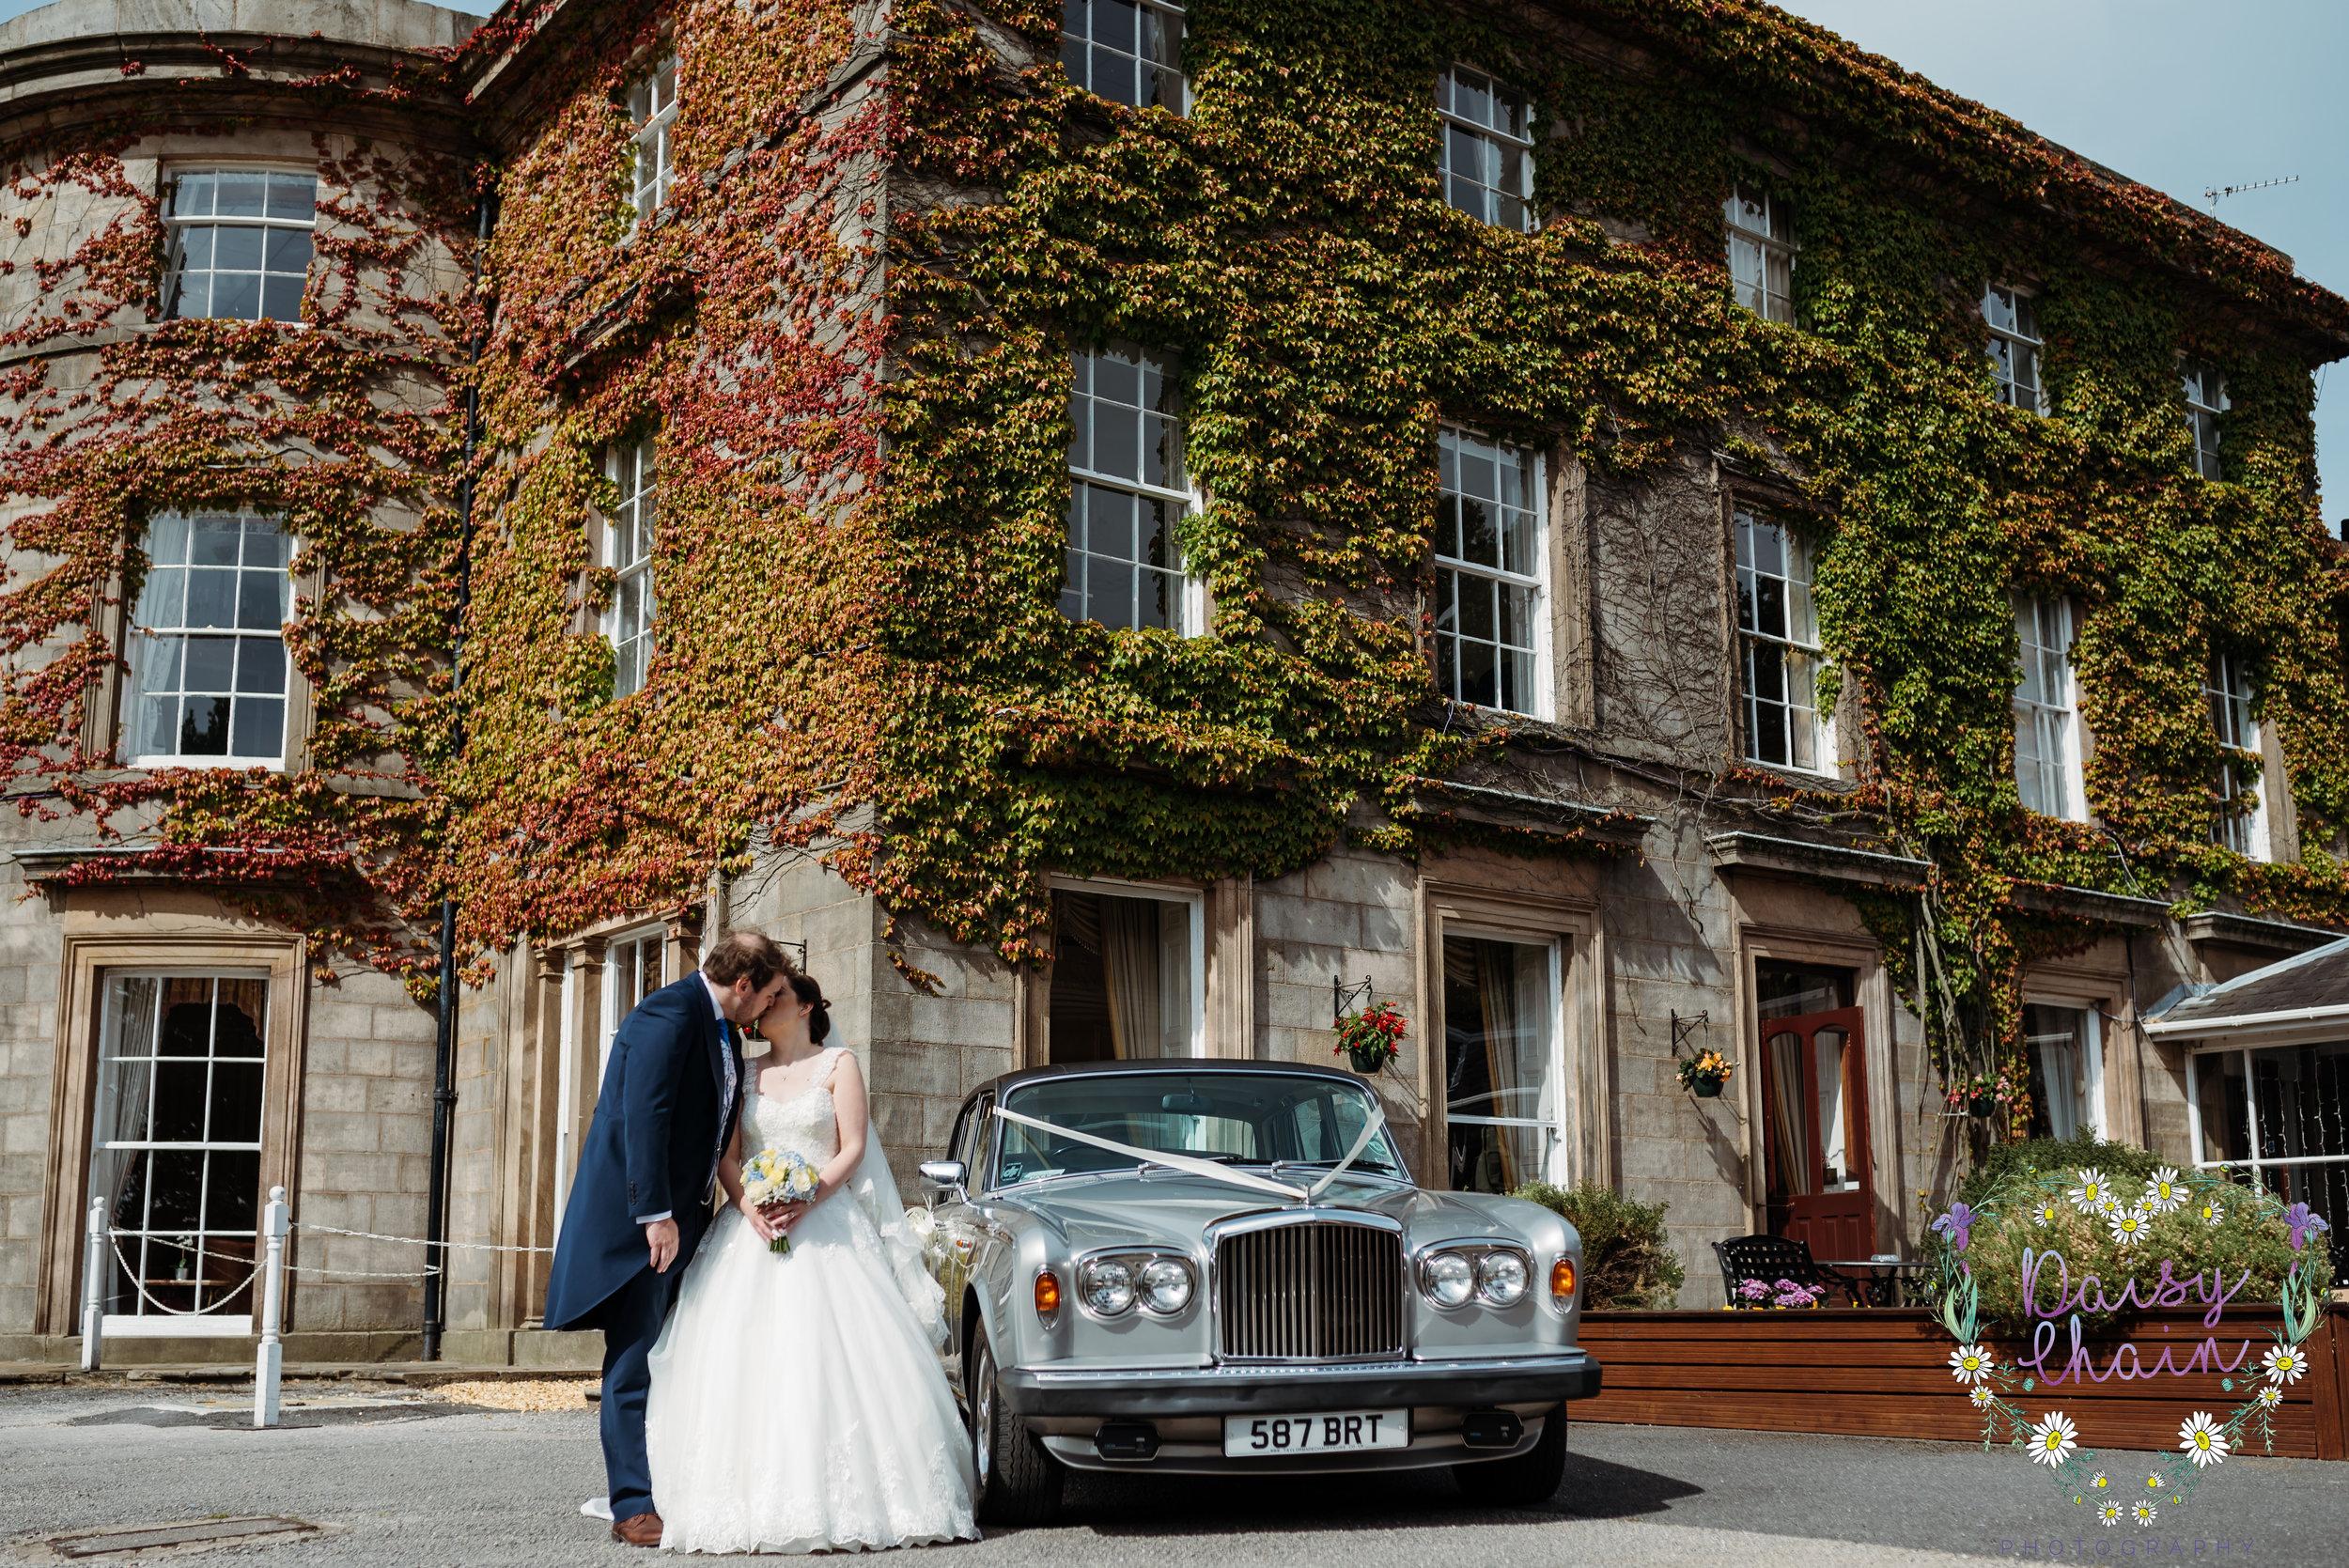 Summer wedding - chorley, lancashire